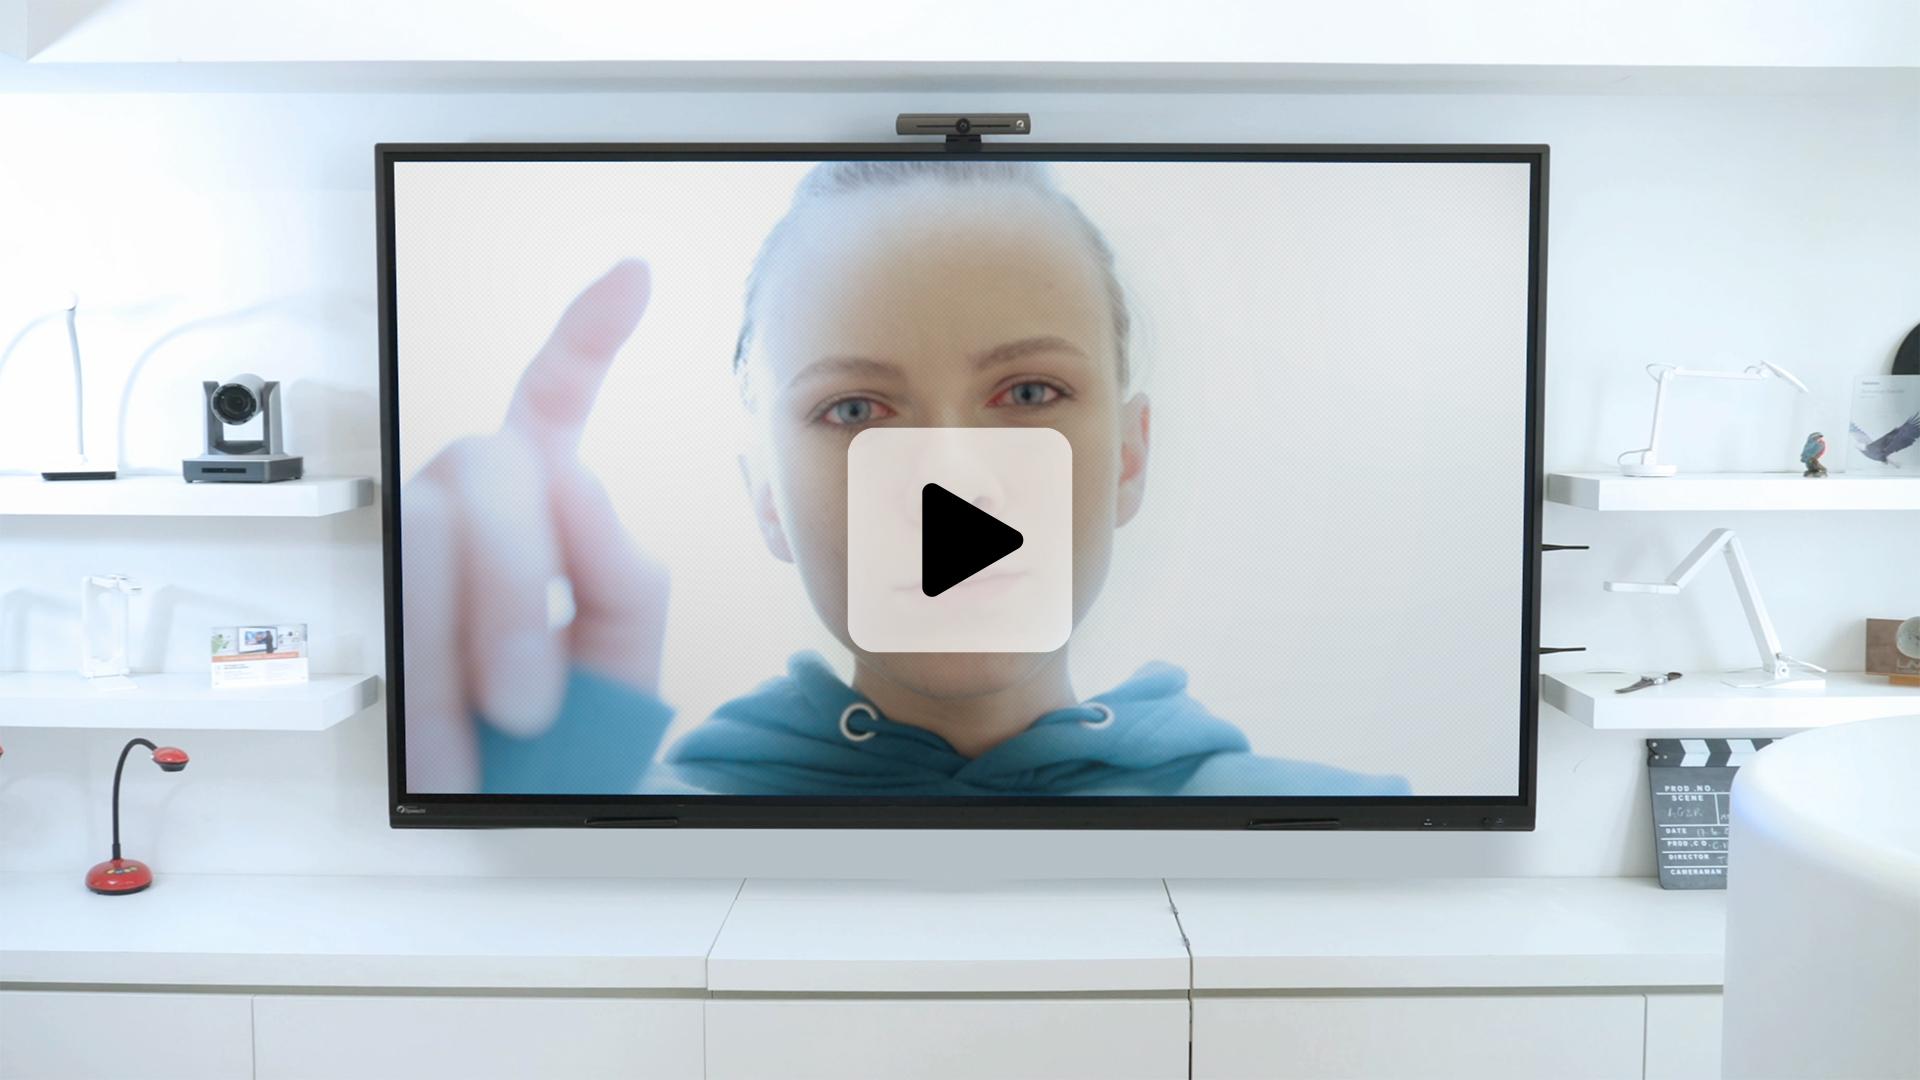 luminosité adaptée sur écran interactif